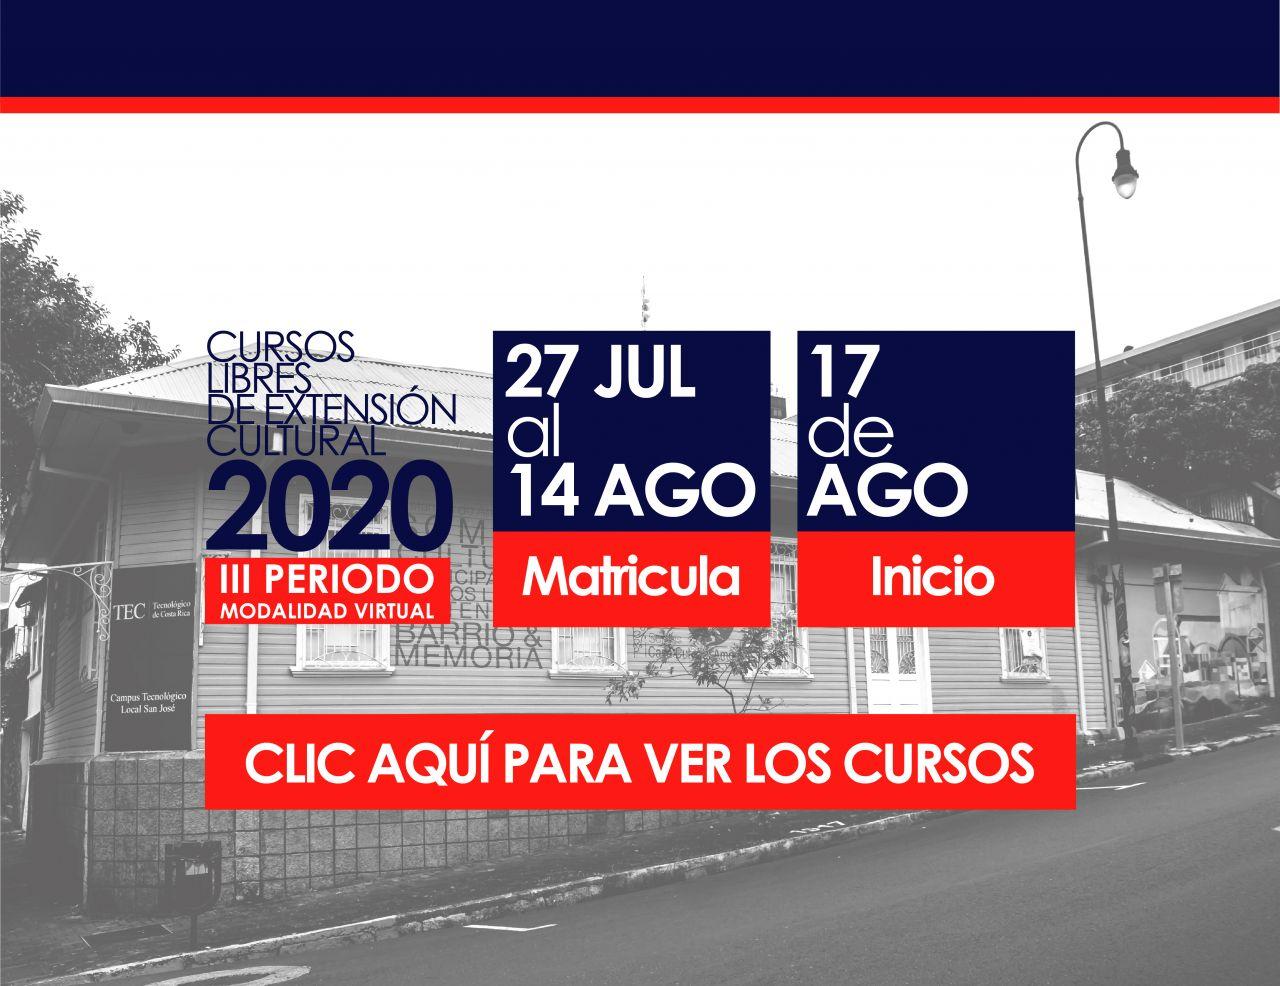 BANNER ENLACE A CURSOS III PERIODO 2020